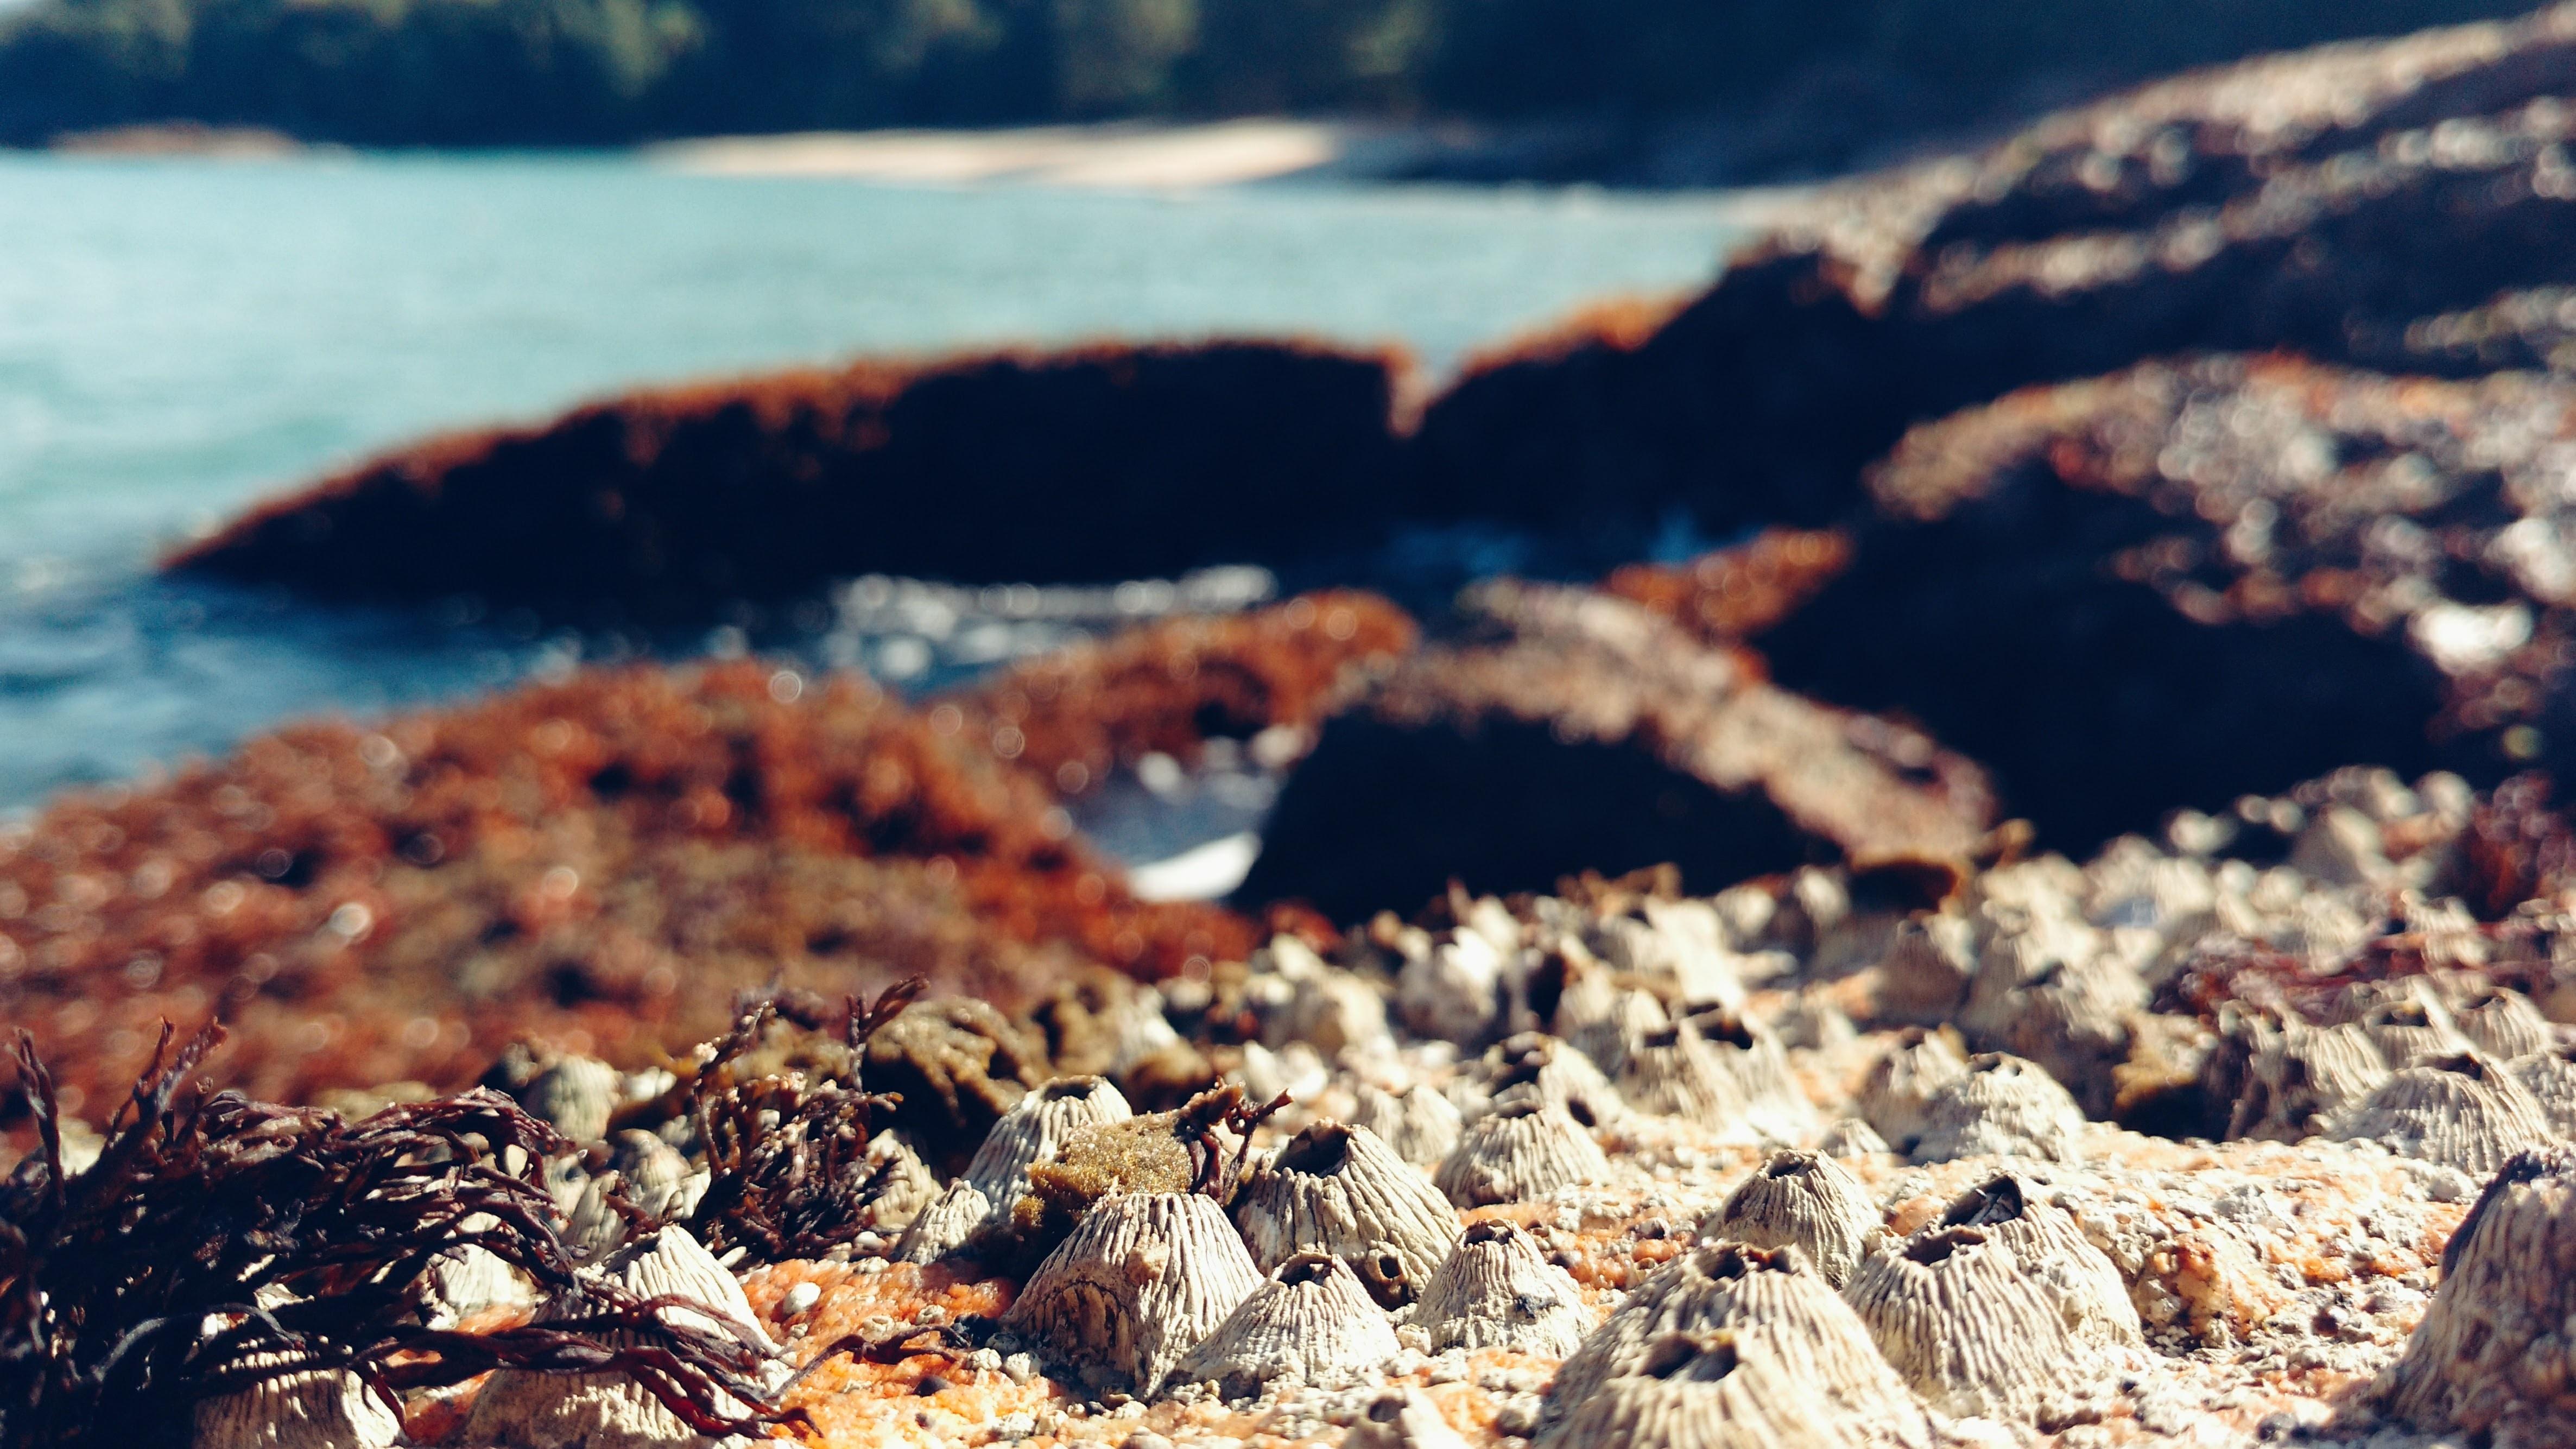 macro photography of seashore during daytime